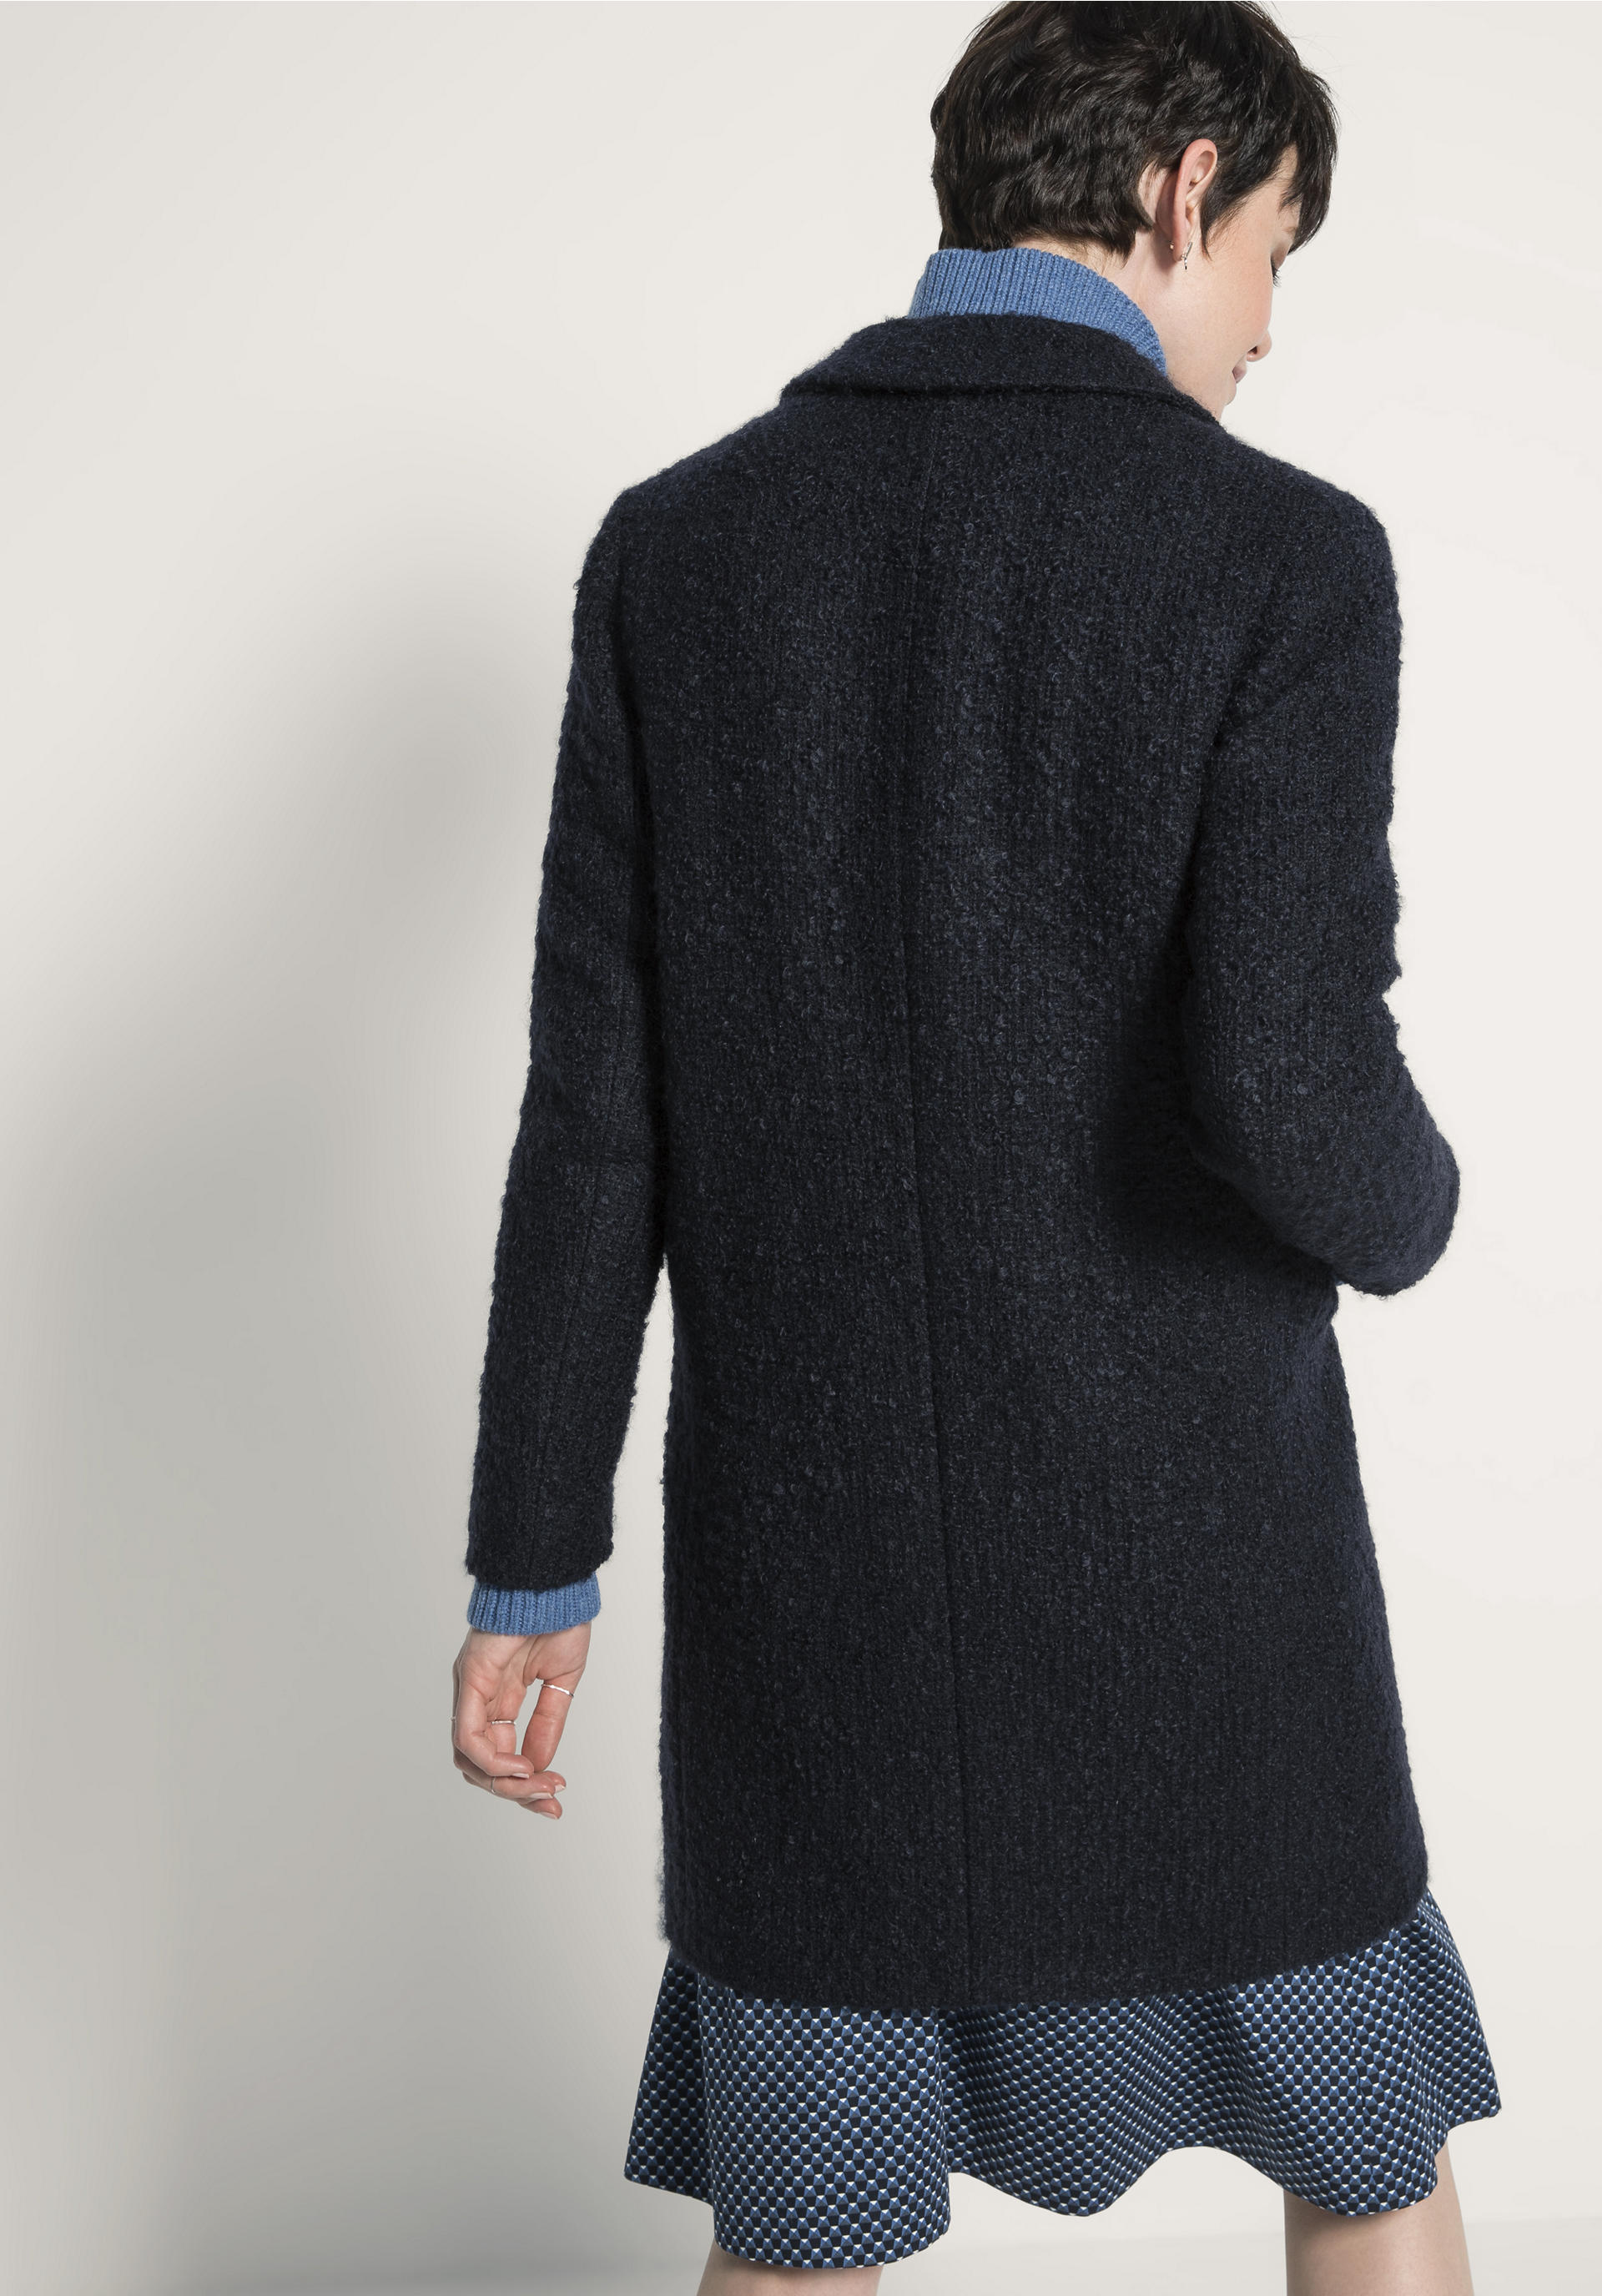 Mohair mantel pflegen